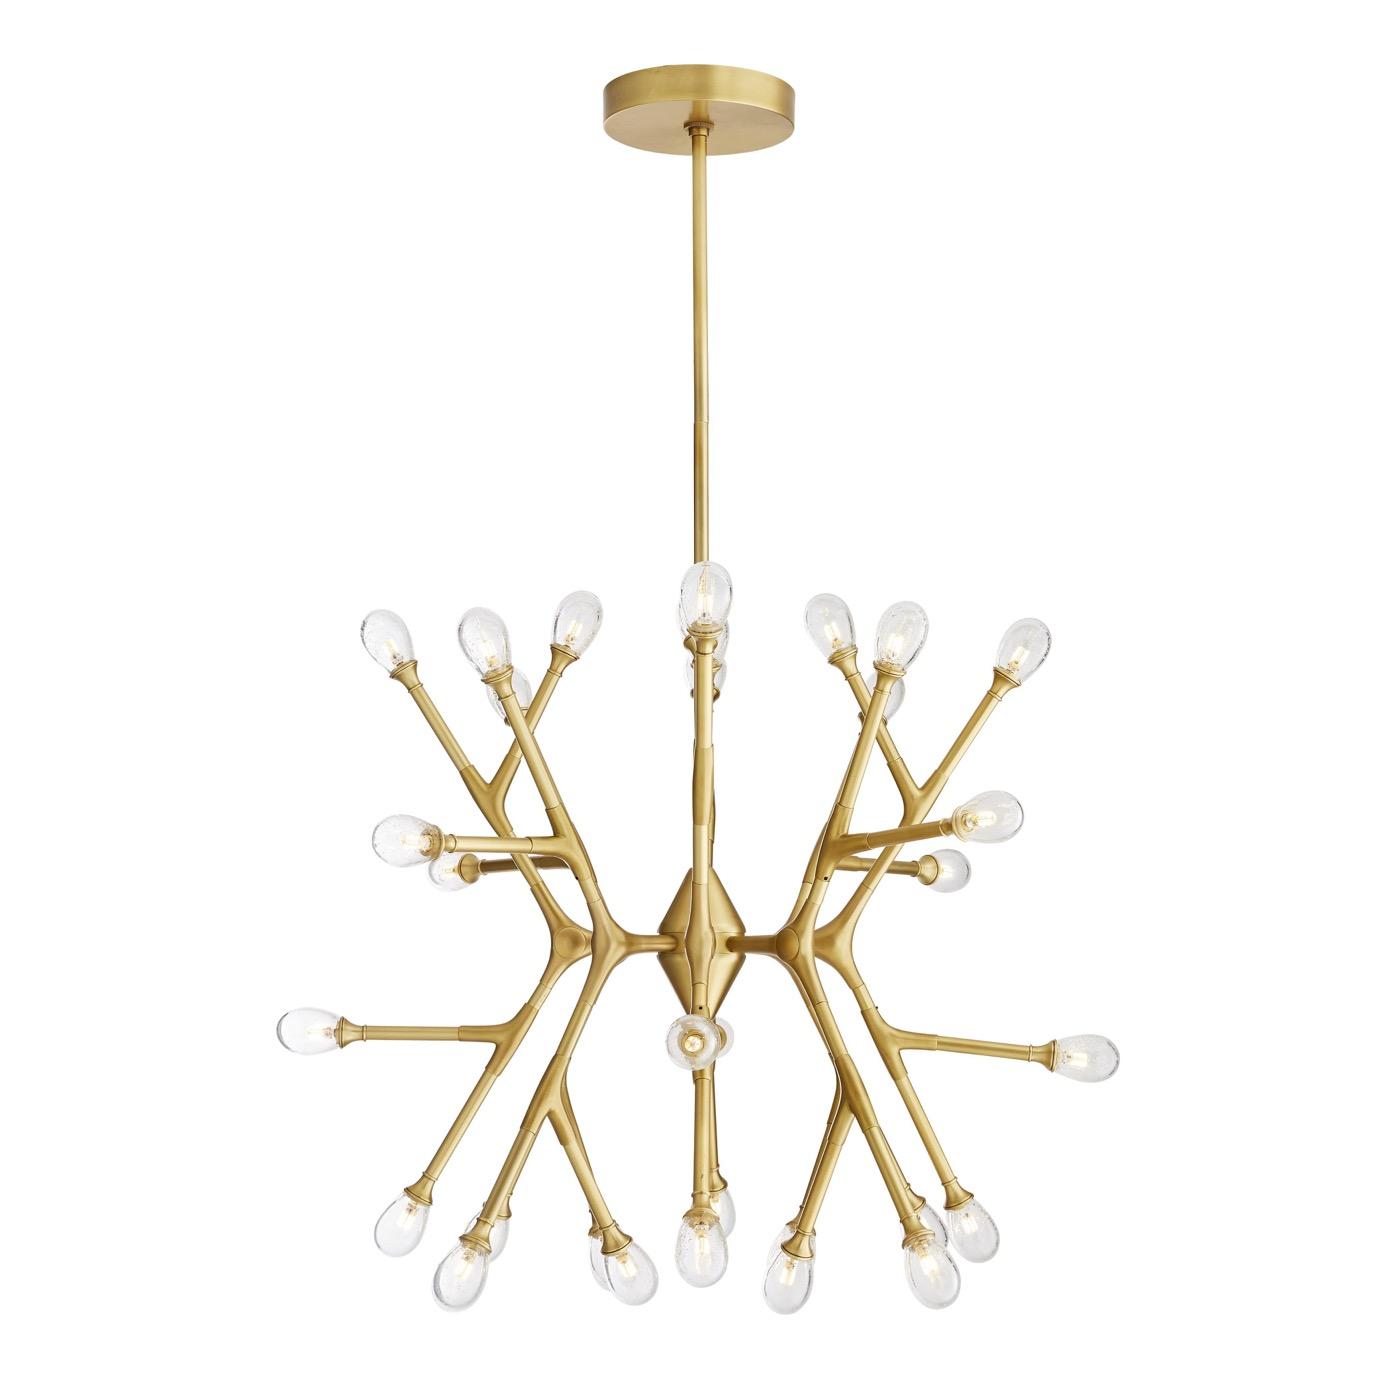 Boltman Brass Chandelier | Cluster